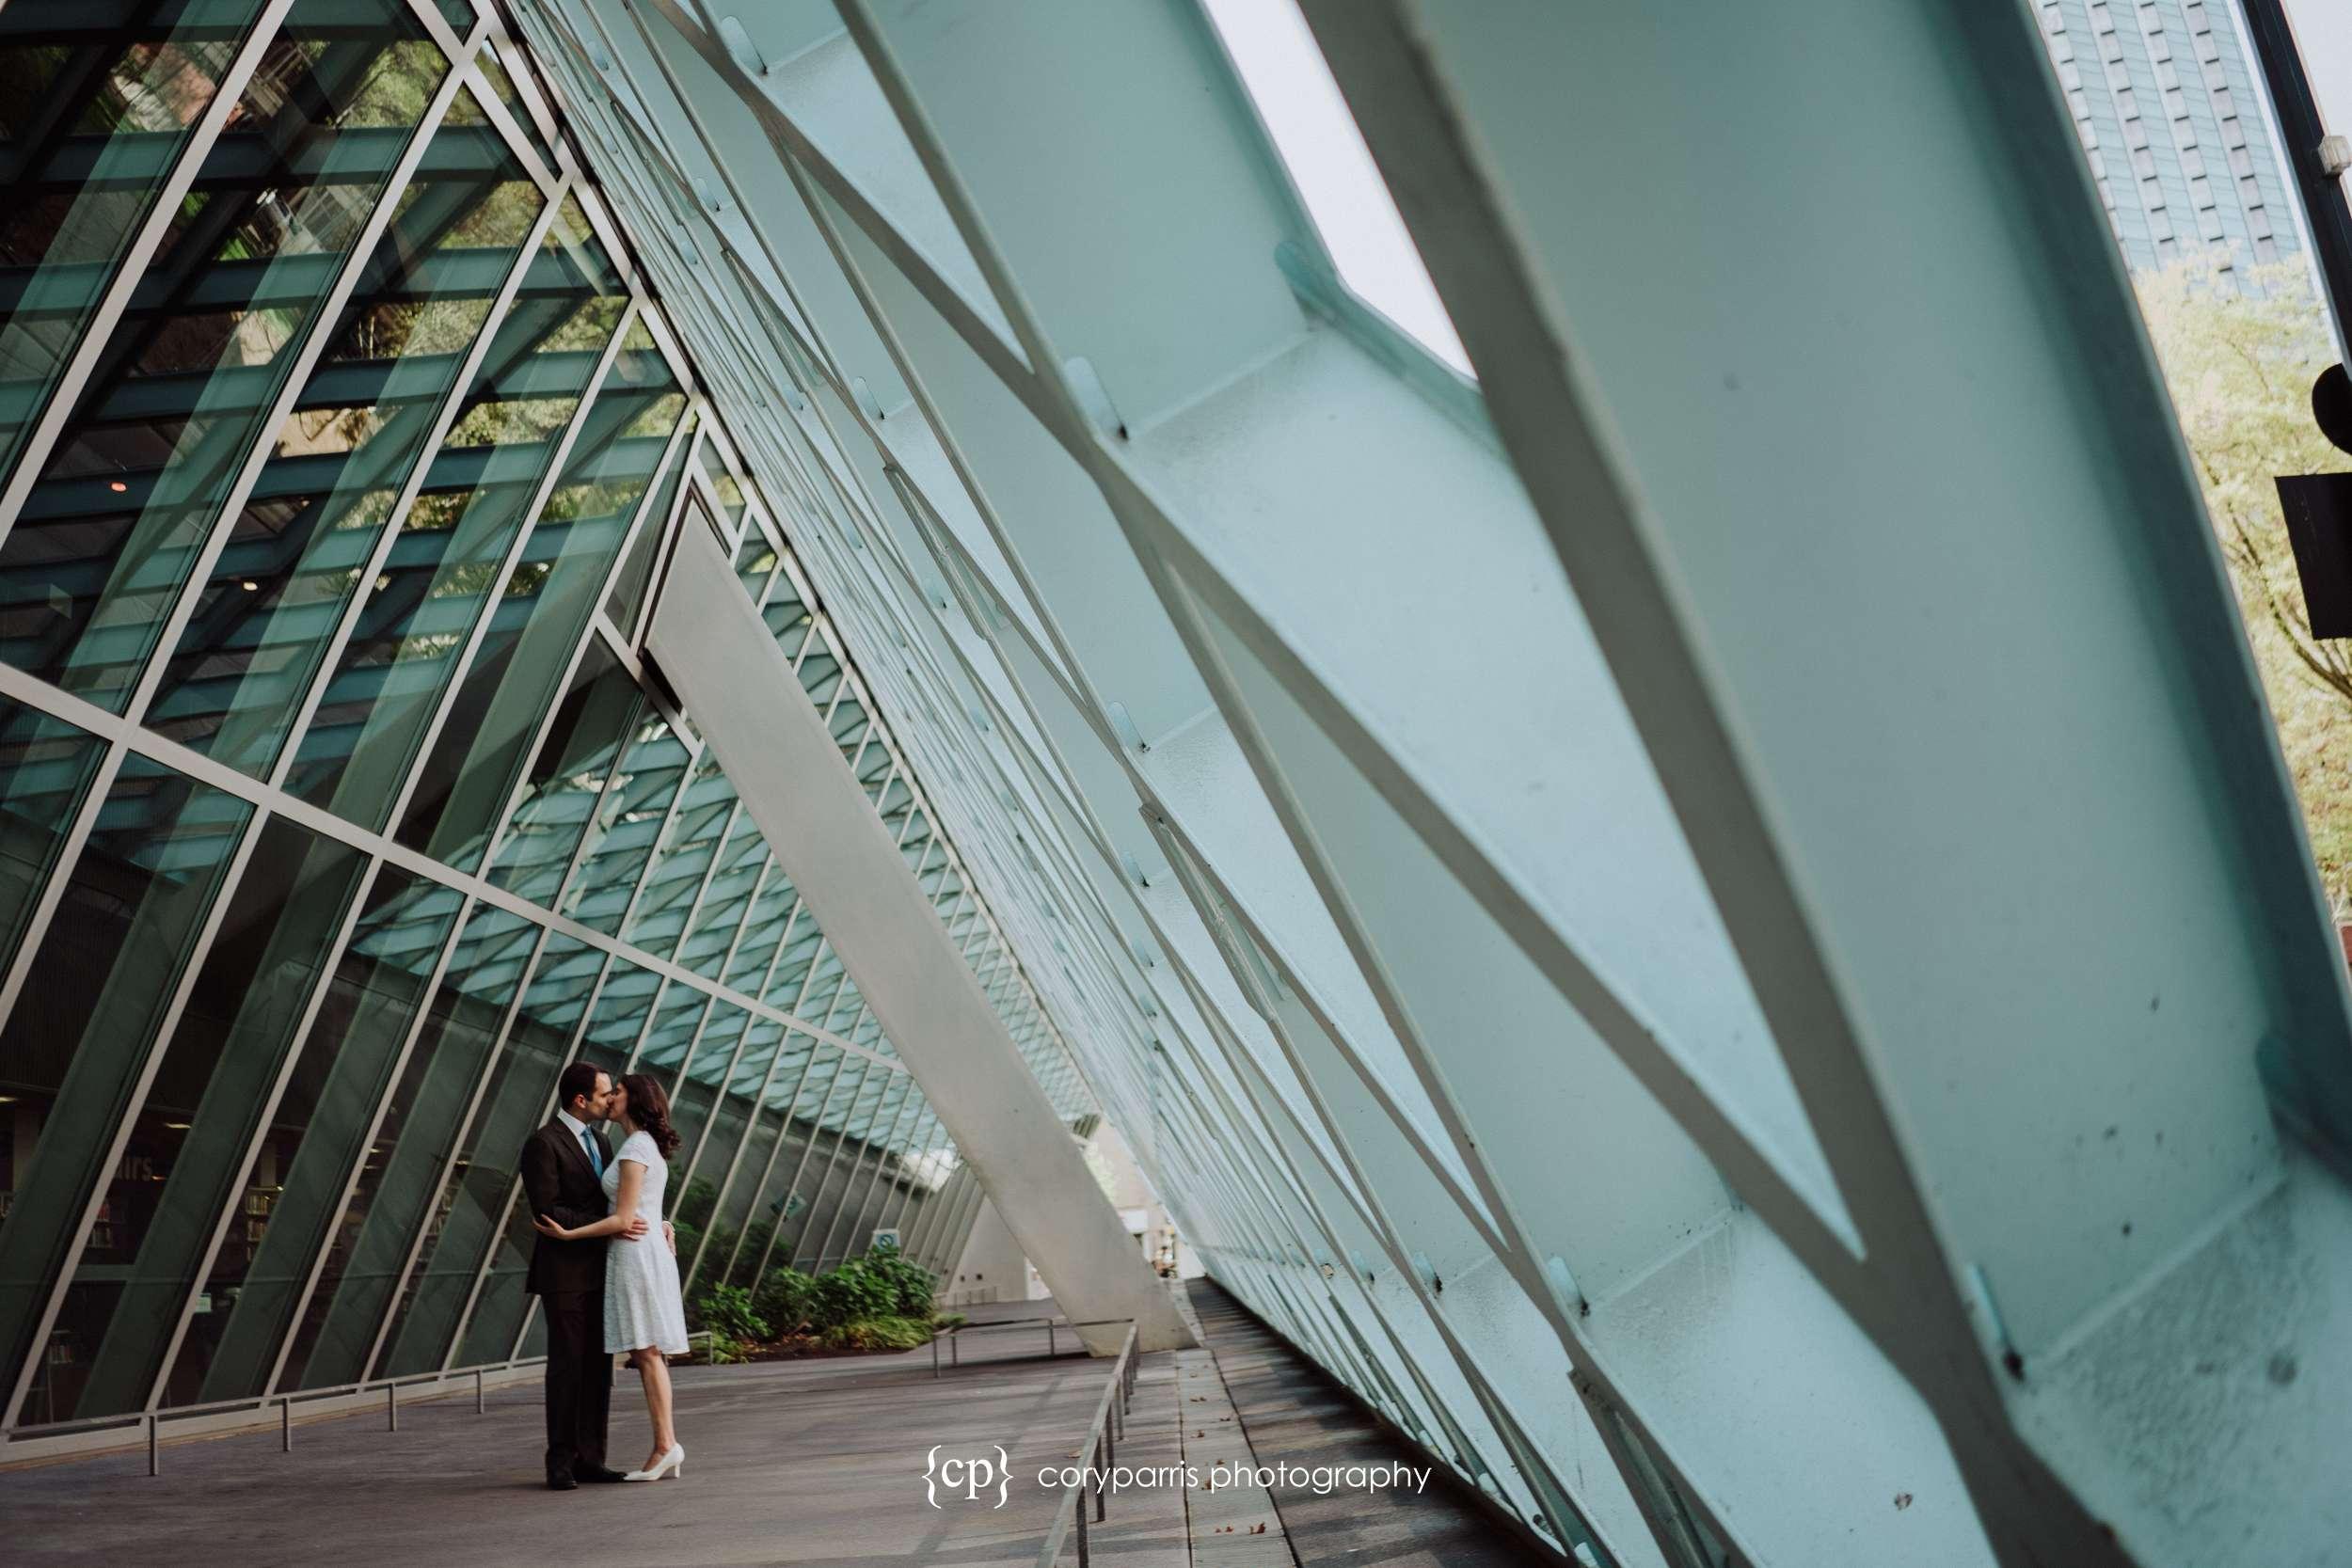 Seattle Public Library entrance